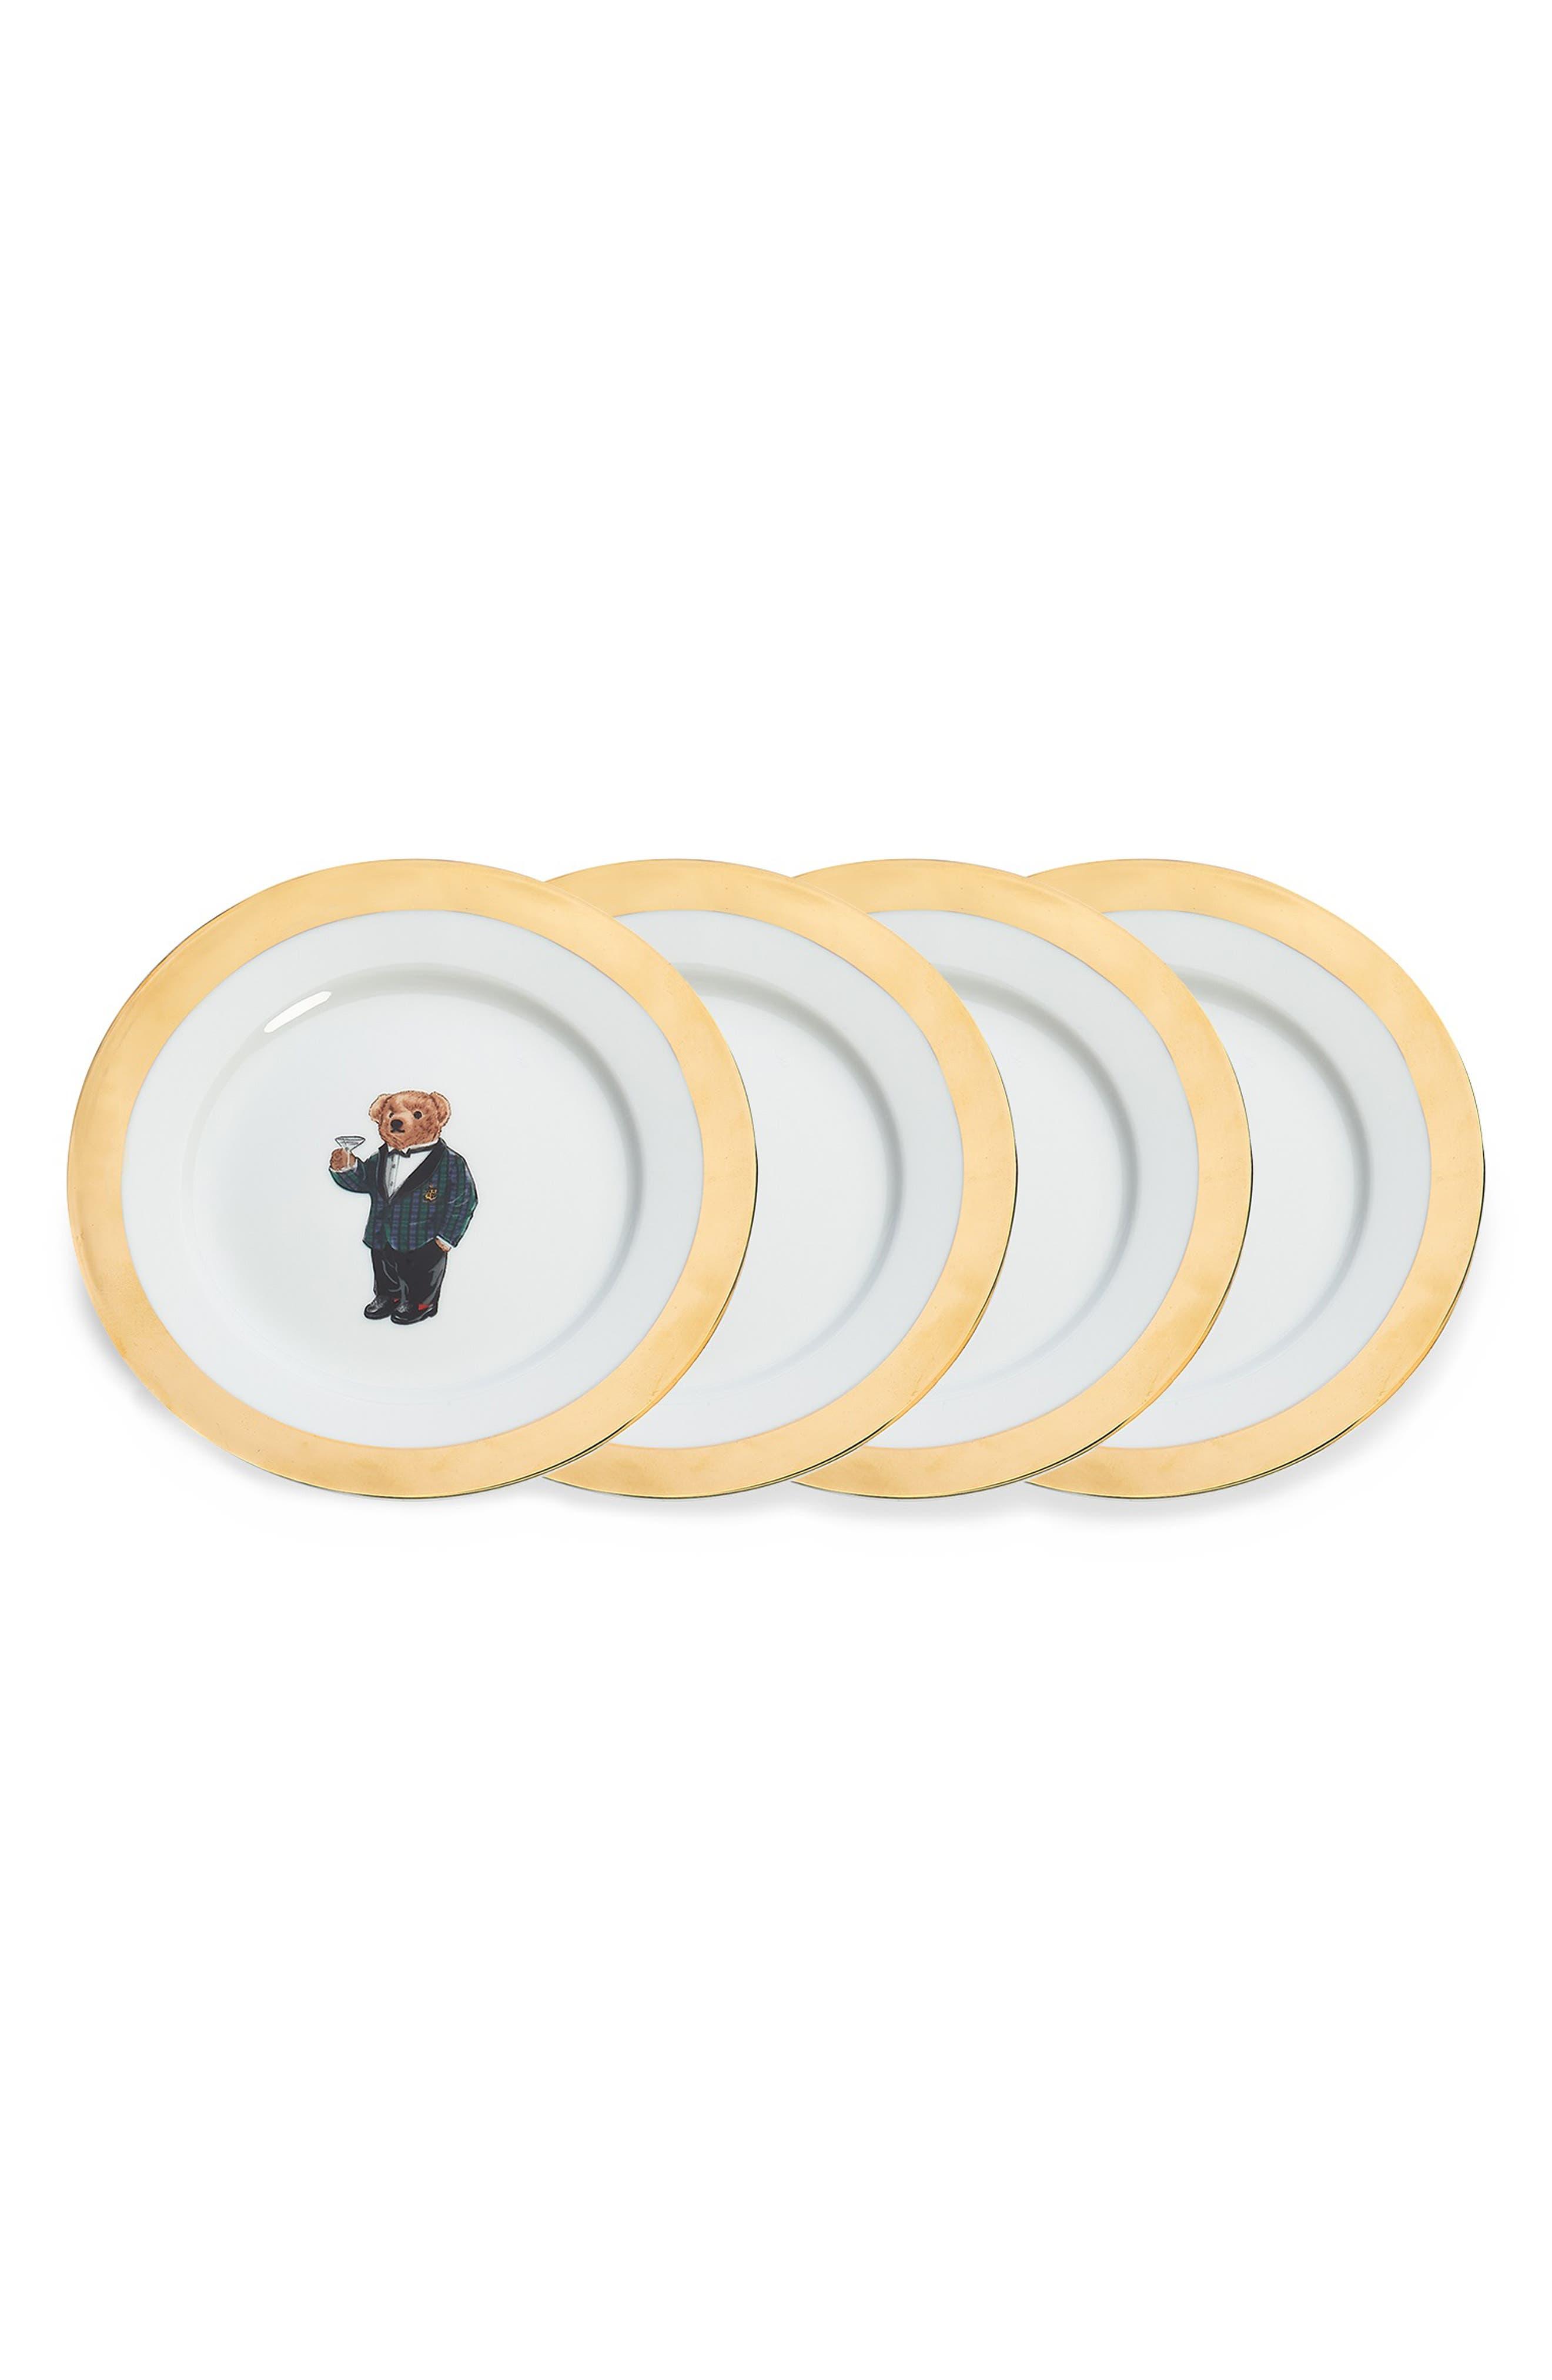 RALPH LAUREN,                             Thompson Set of 4 Dessert Plates,                             Main thumbnail 1, color,                             ASSORTED